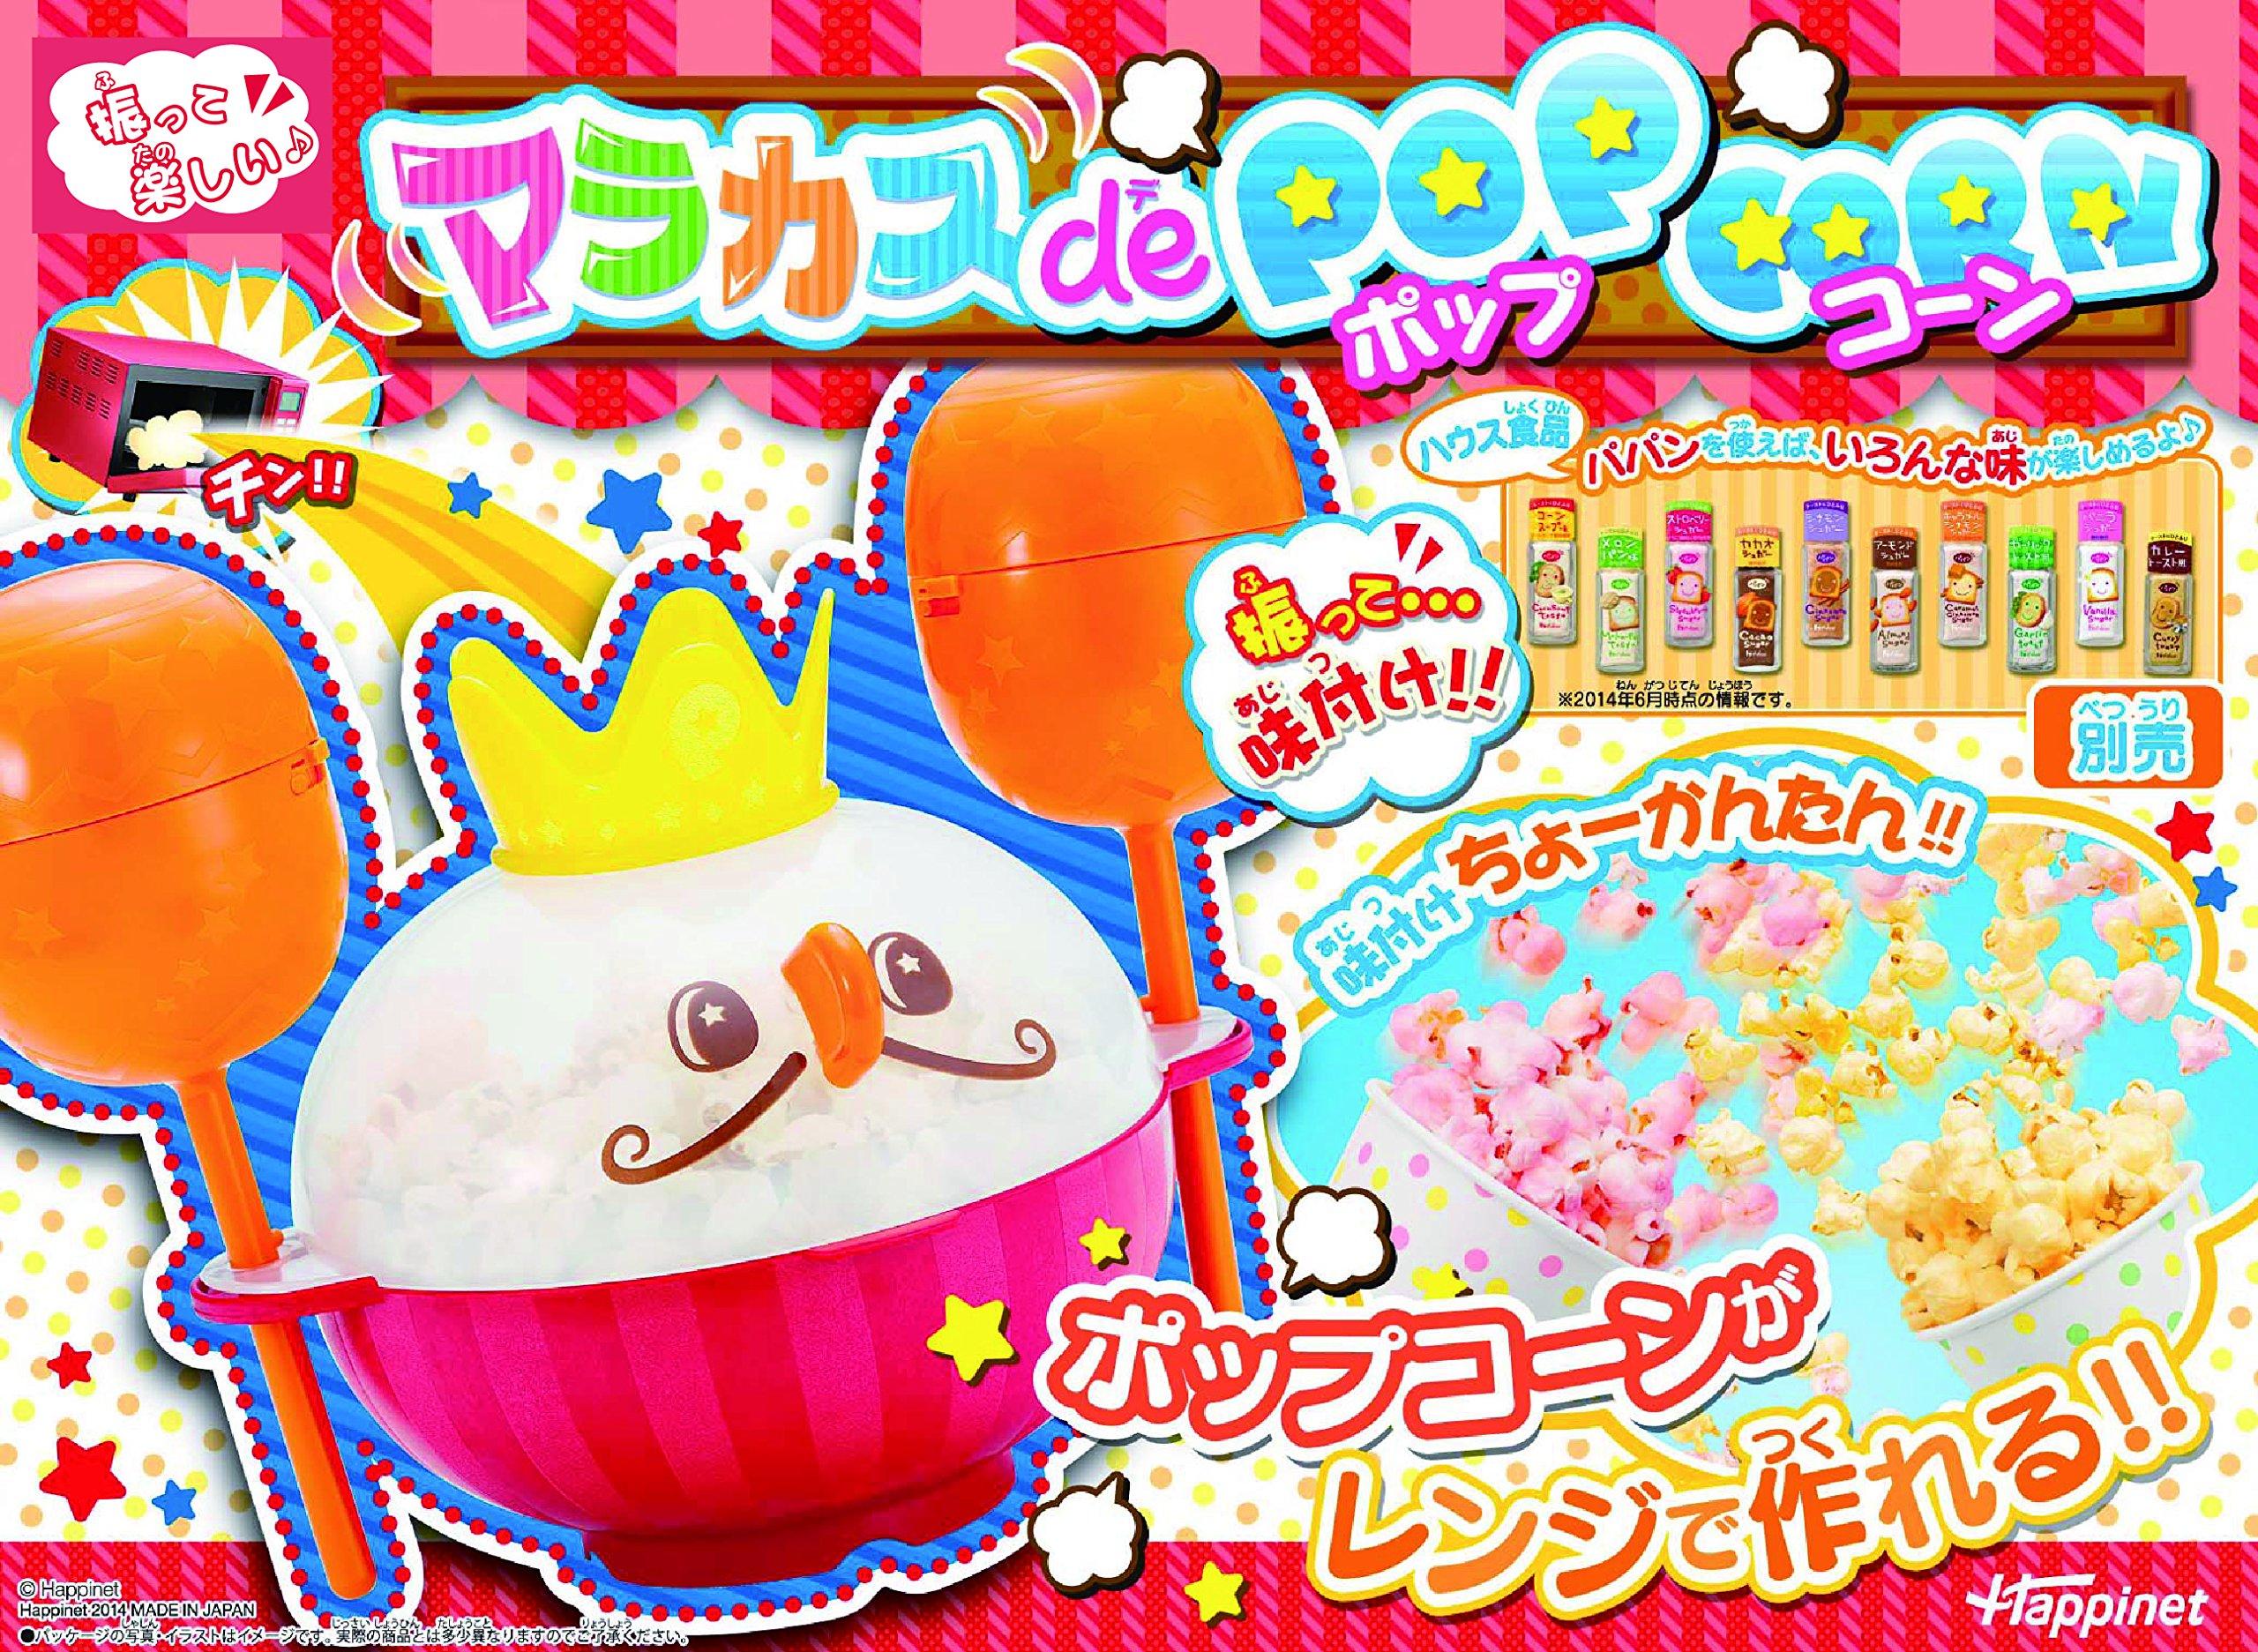 Happinet Original, Maracas De Popcorn [Japan Import]